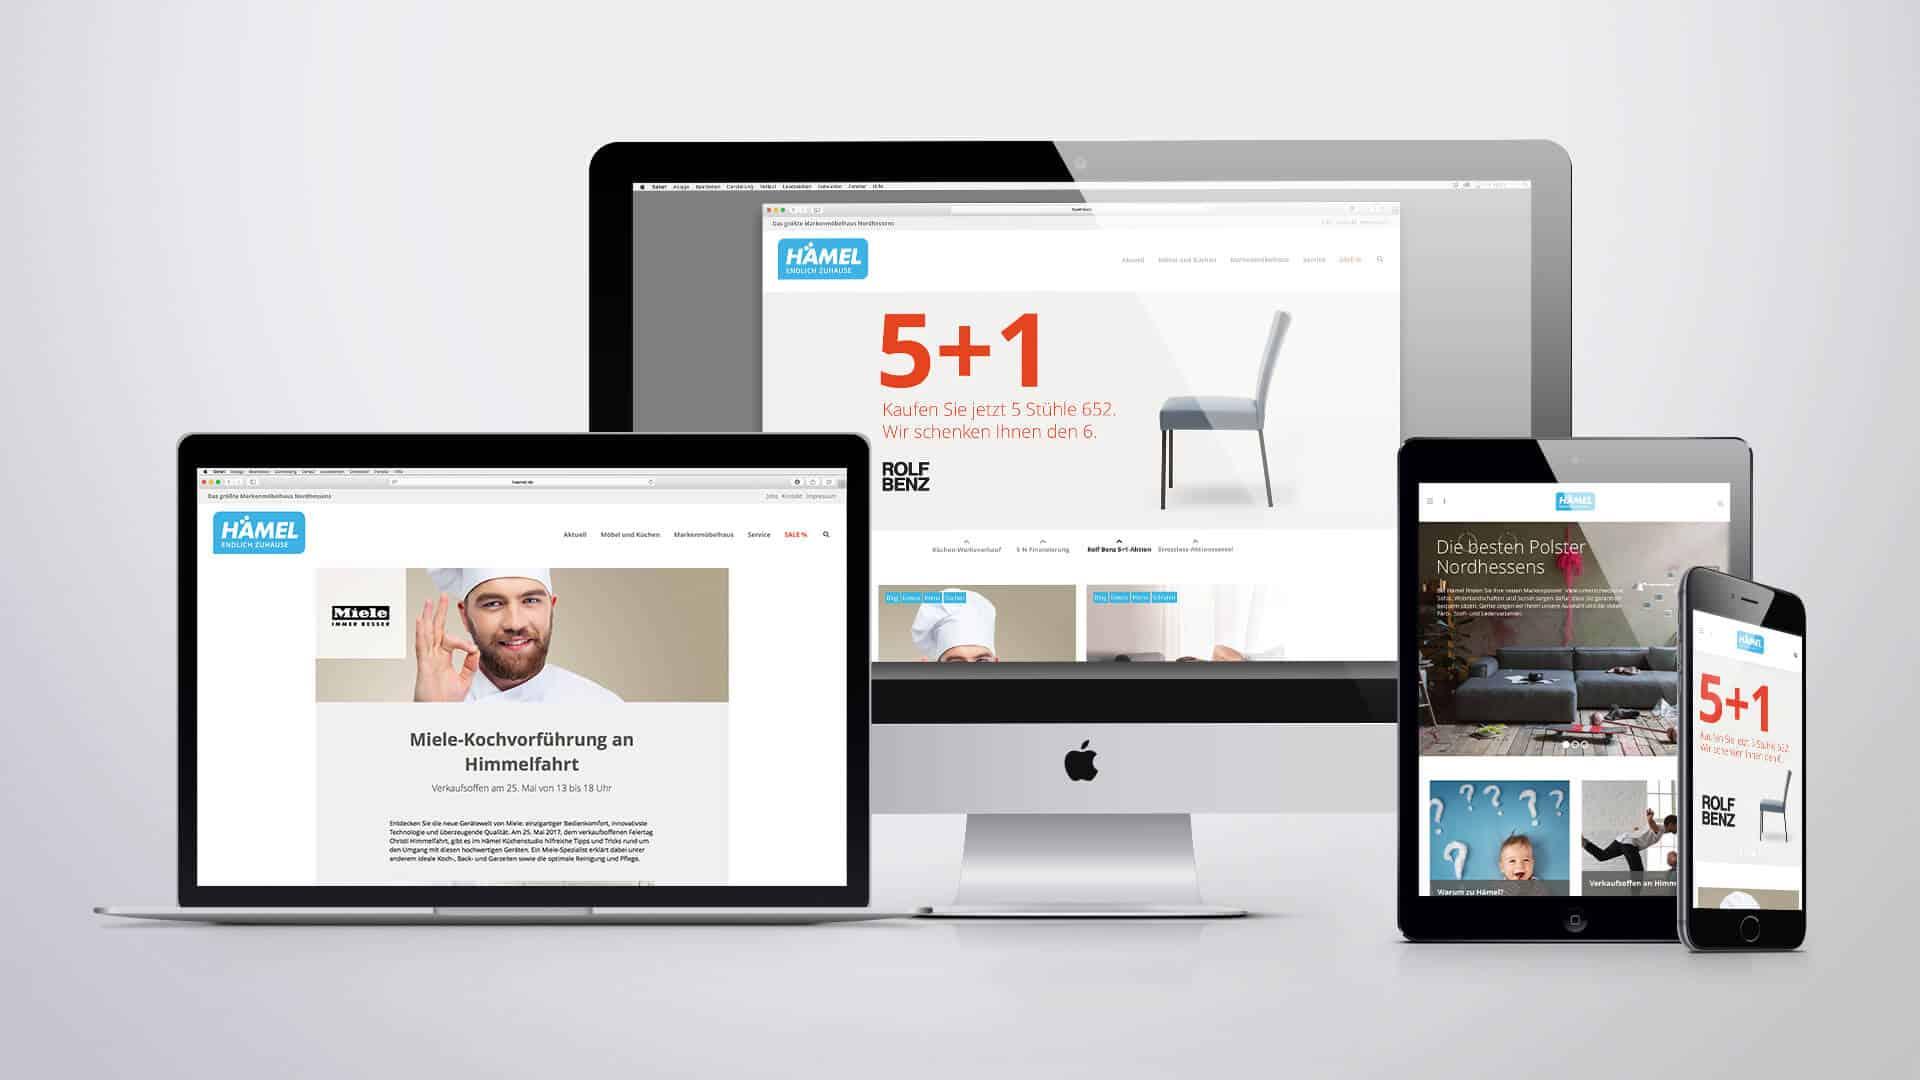 Gerryland-Referenz-Hämel-Website-Mockup-Online-marketing